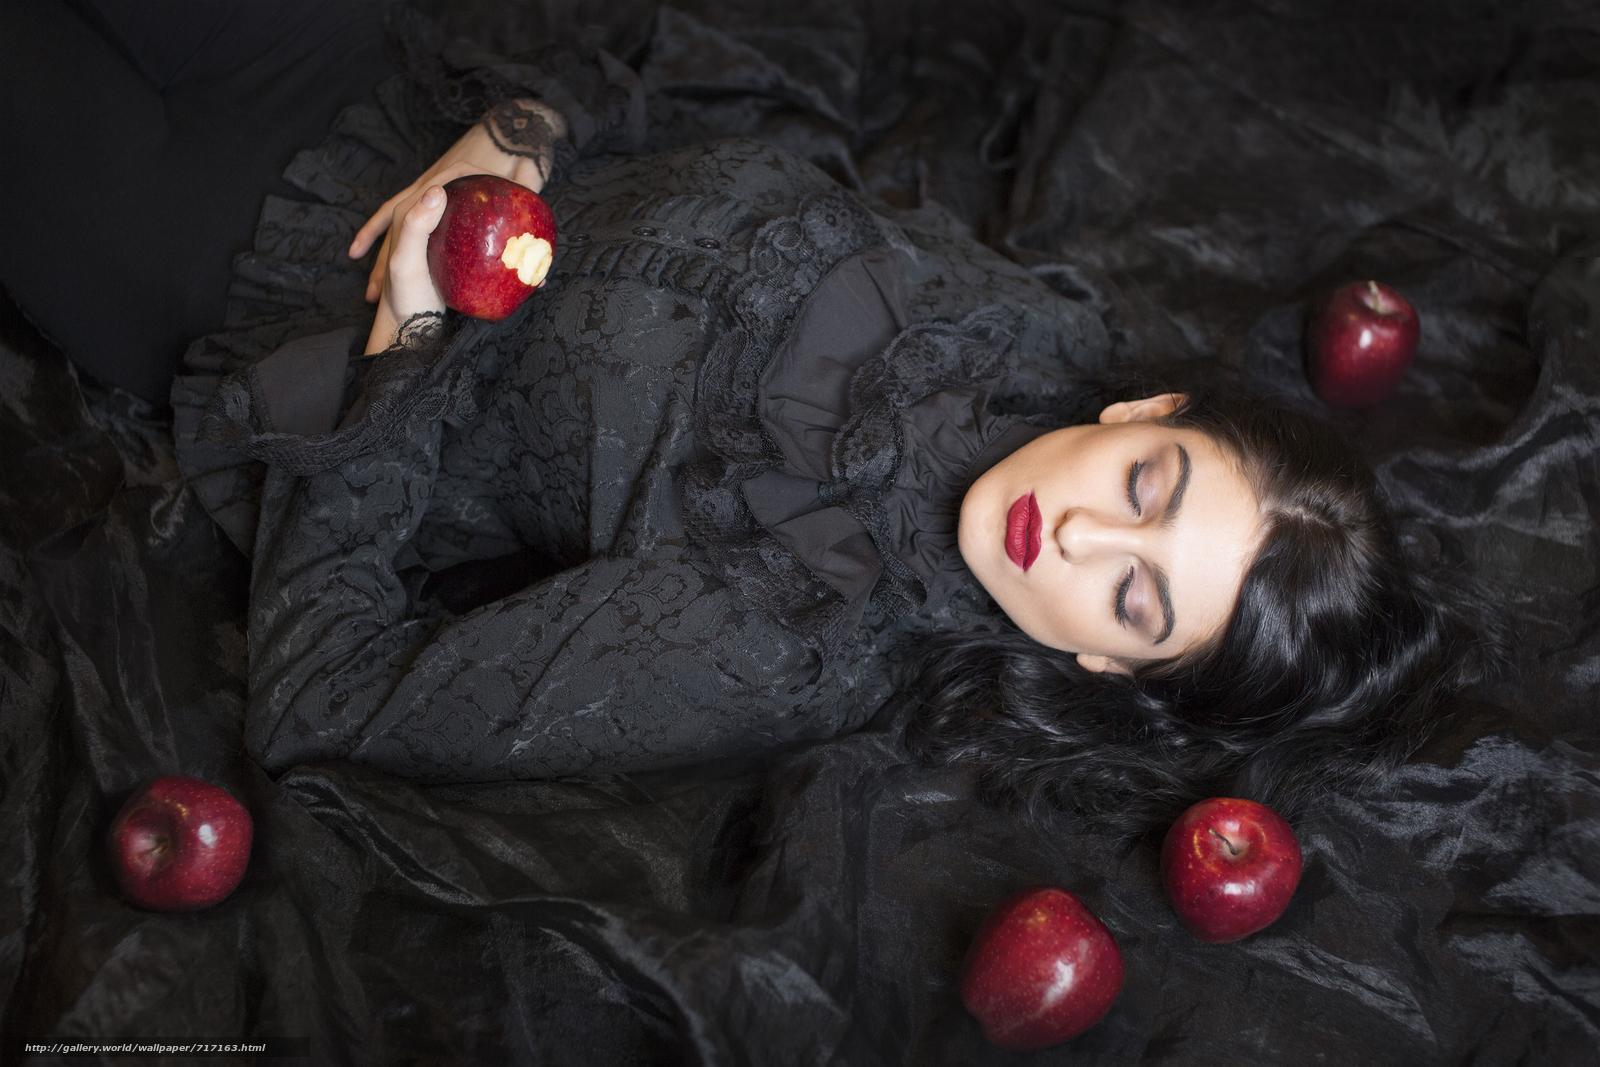 Игра Спящая красавица: макияж (Sleeping beauty makeover) 76